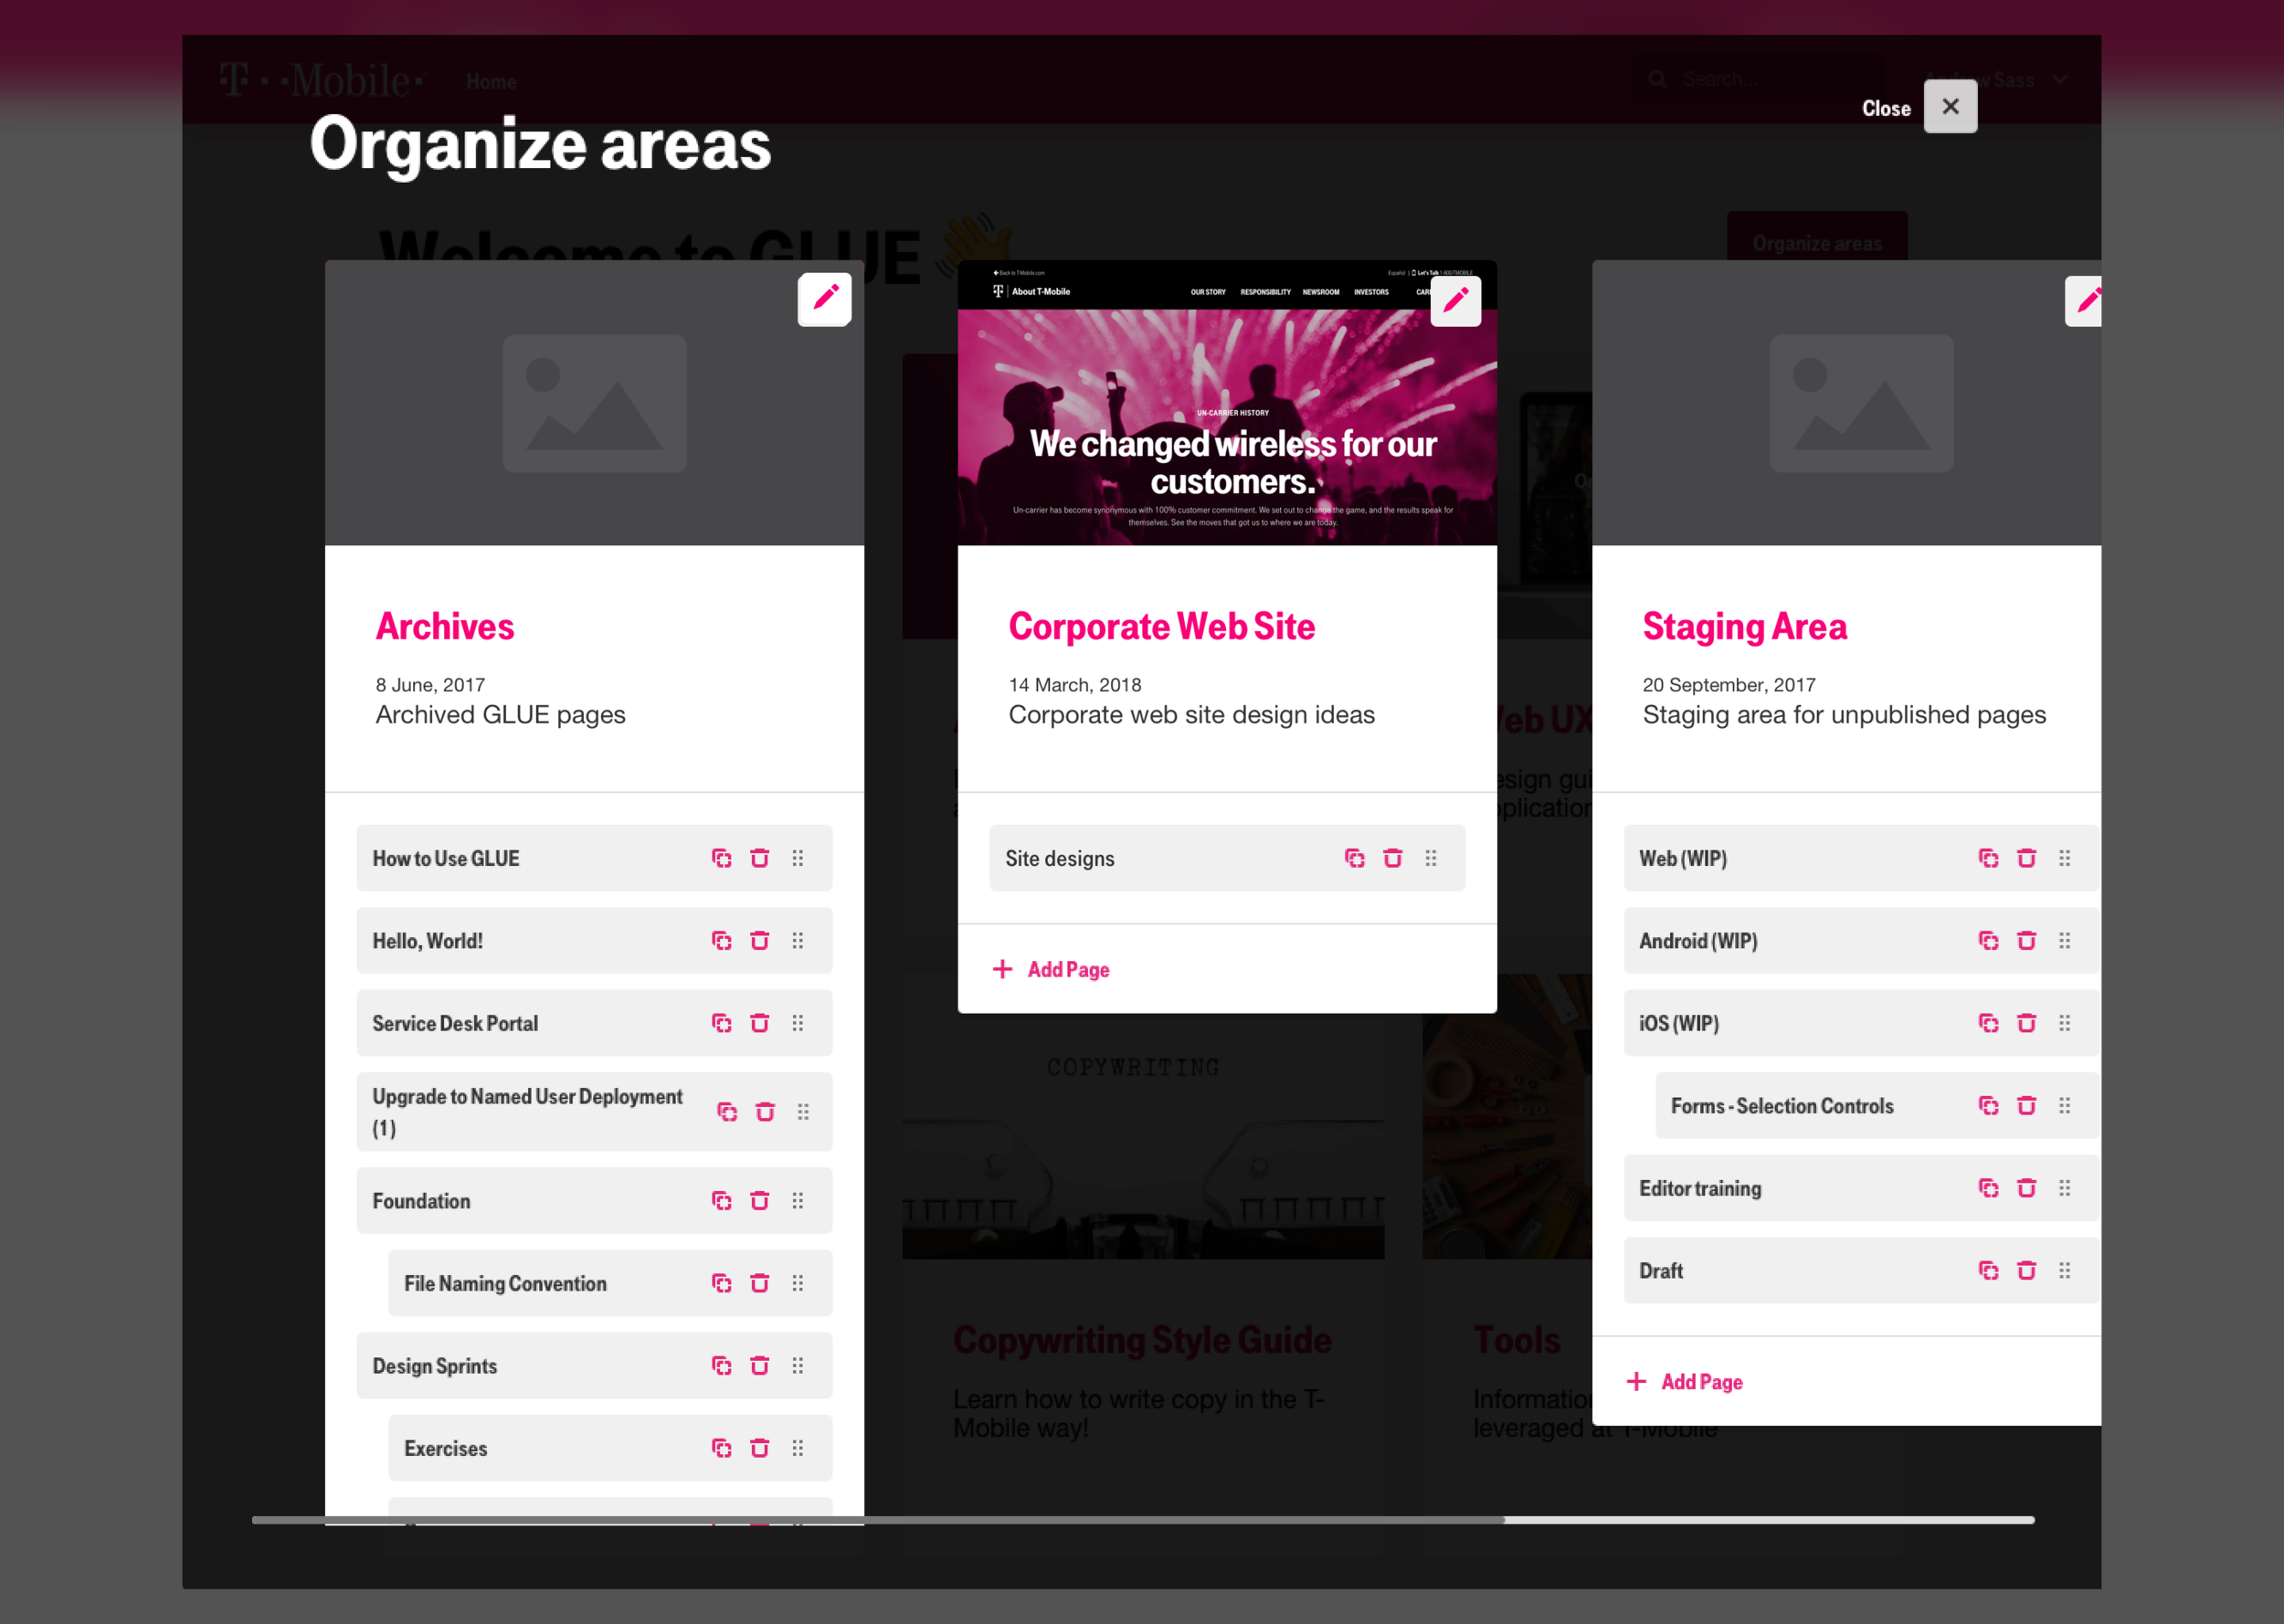 GLUE Organize areas